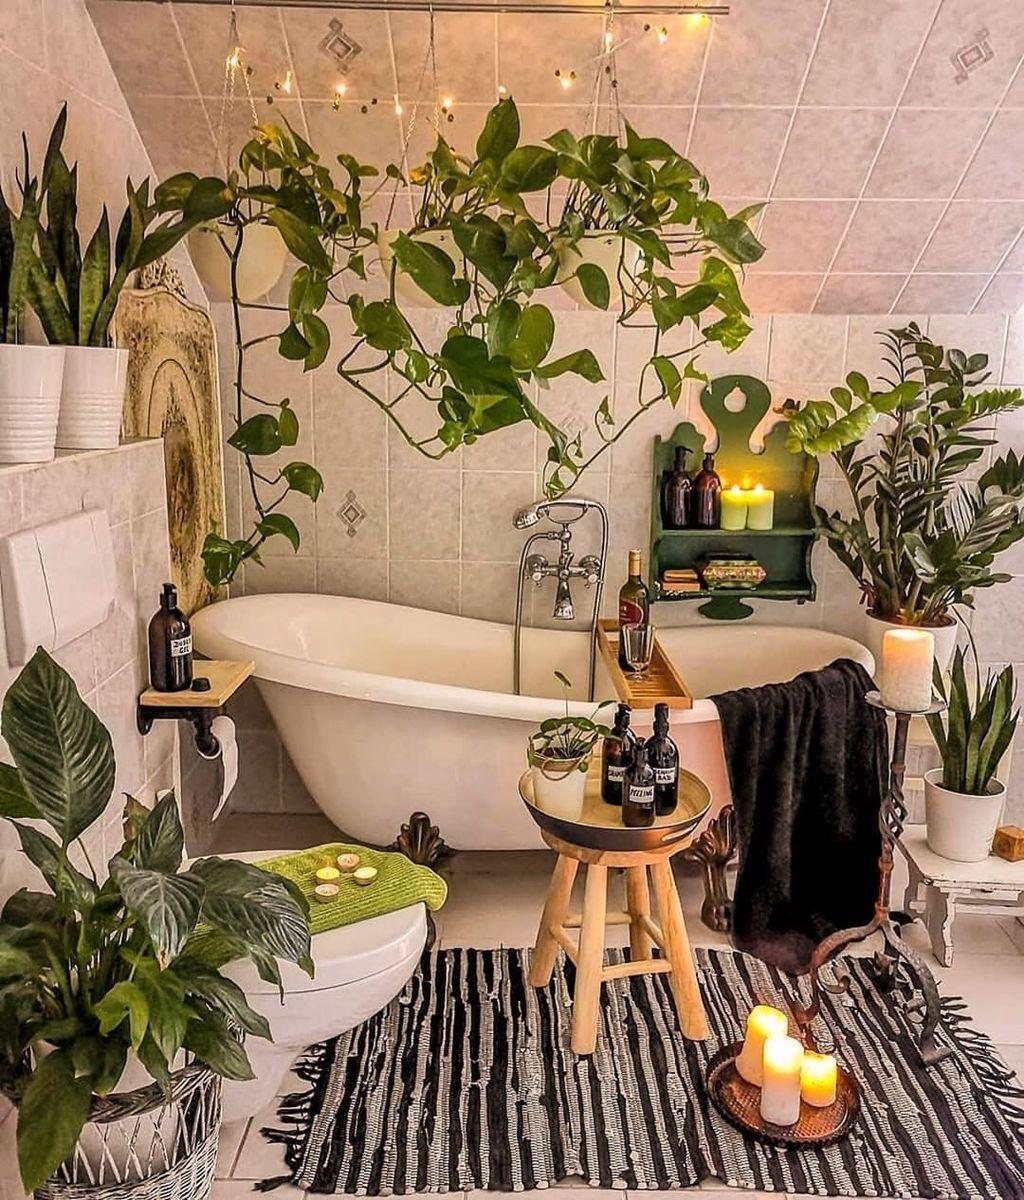 The Best Jungle Bathroom Decor Ideas To Get A Natural Impression 22